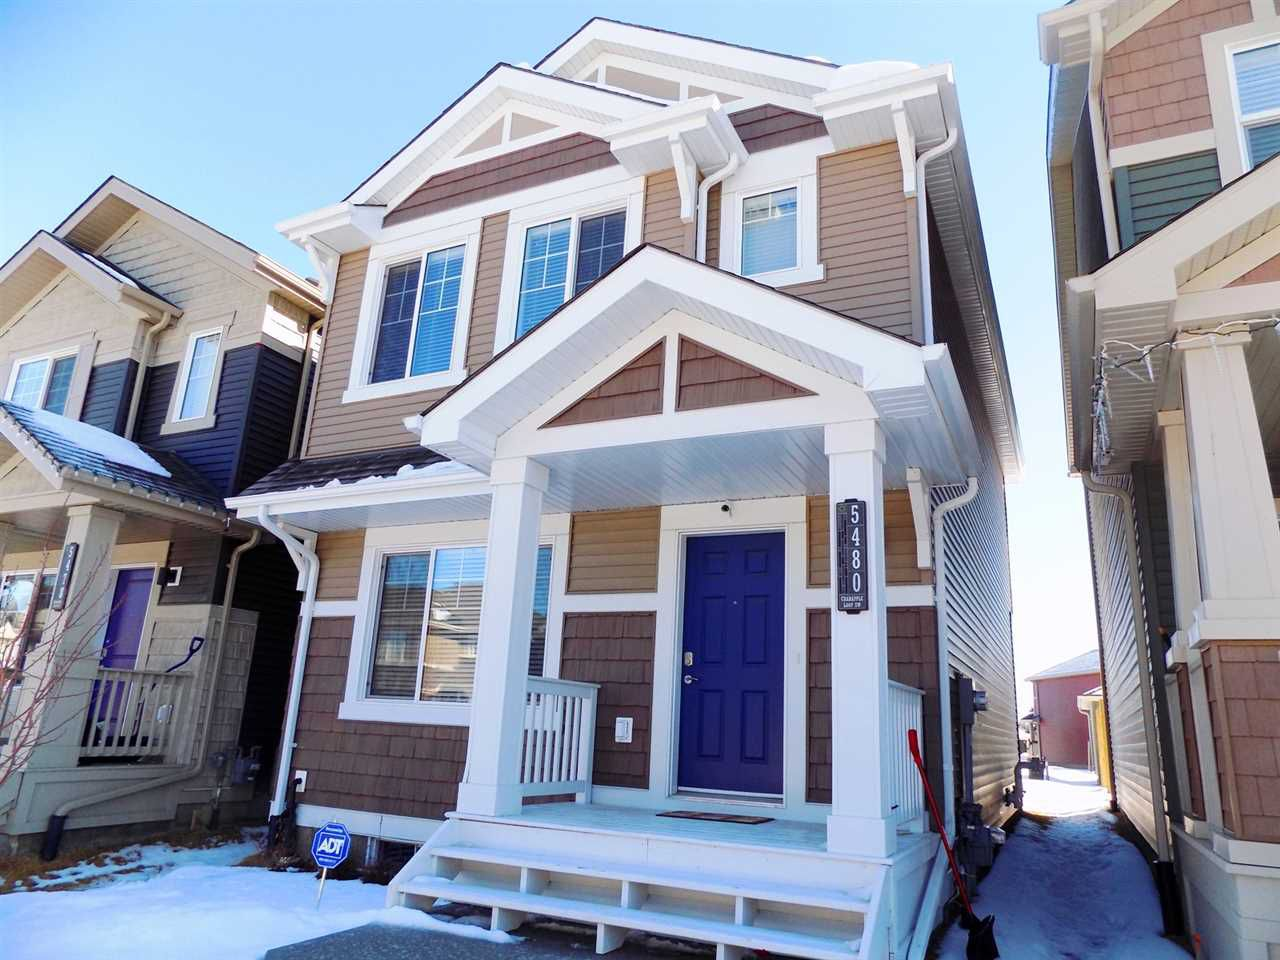 Main Photo: 5480 CRABAPPLE Loop SW in Edmonton: Zone 53 House for sale : MLS®# E4143686